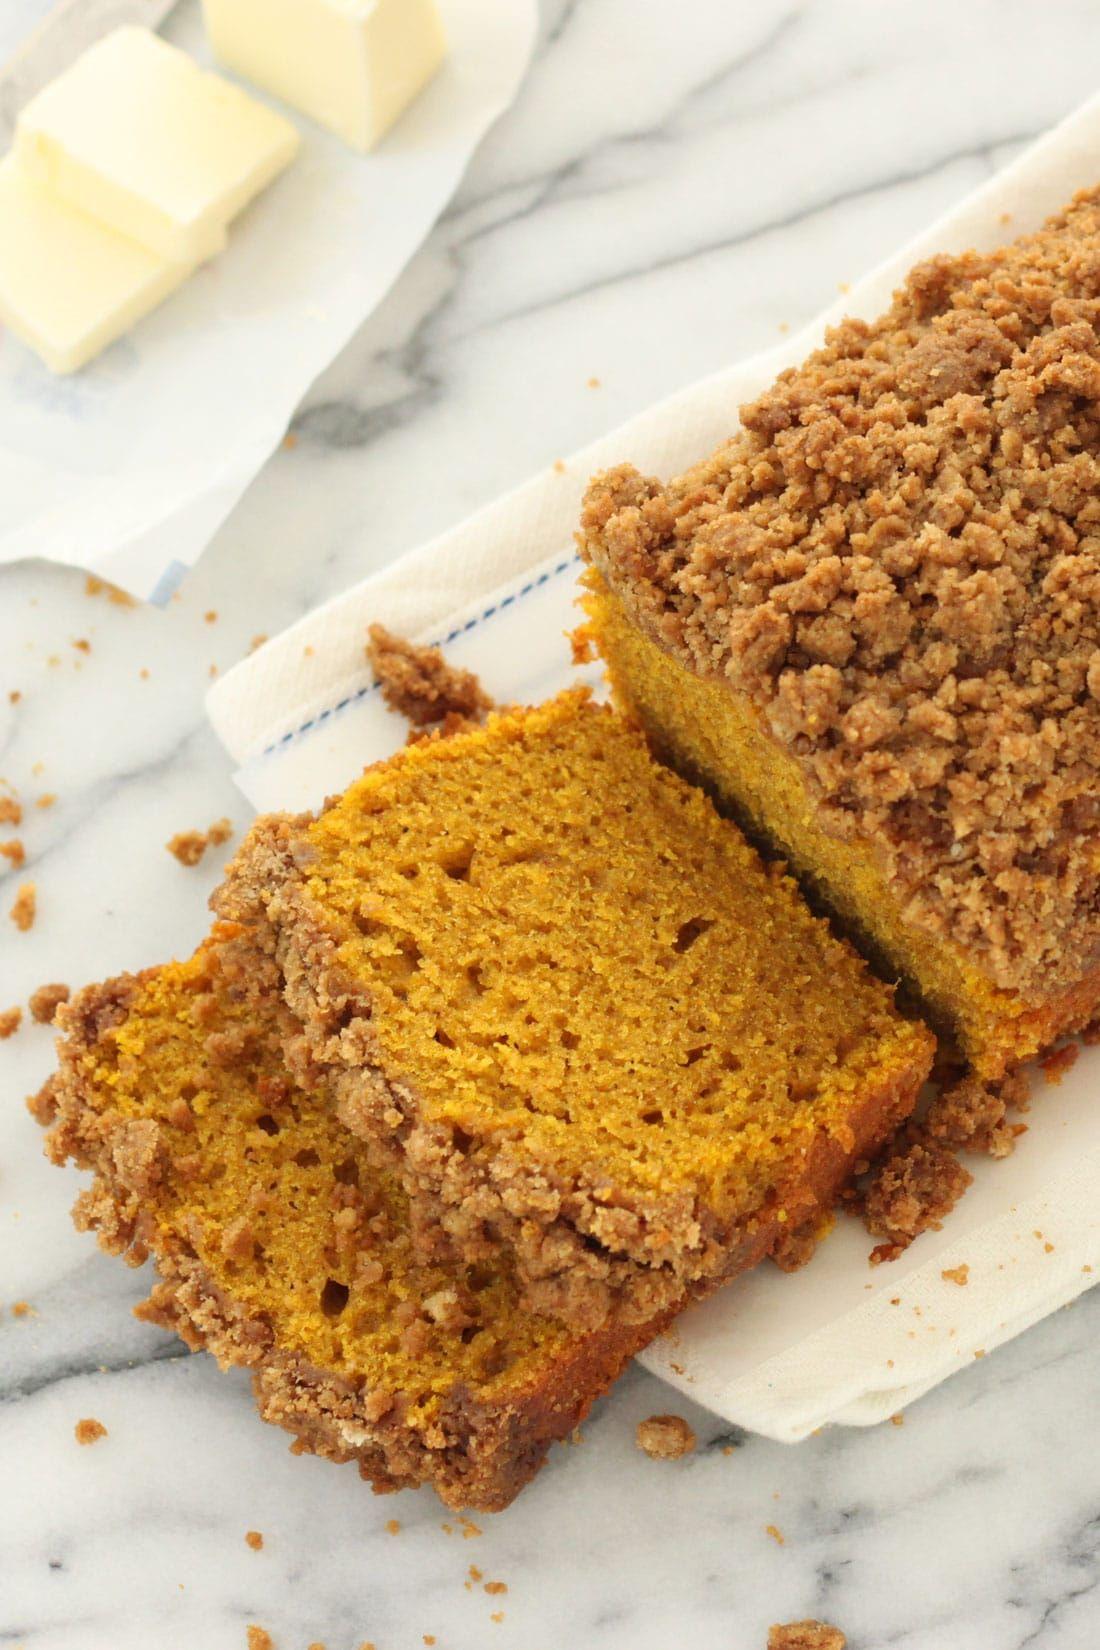 Cinnamon crunch pumpkin bread miss jones baking co